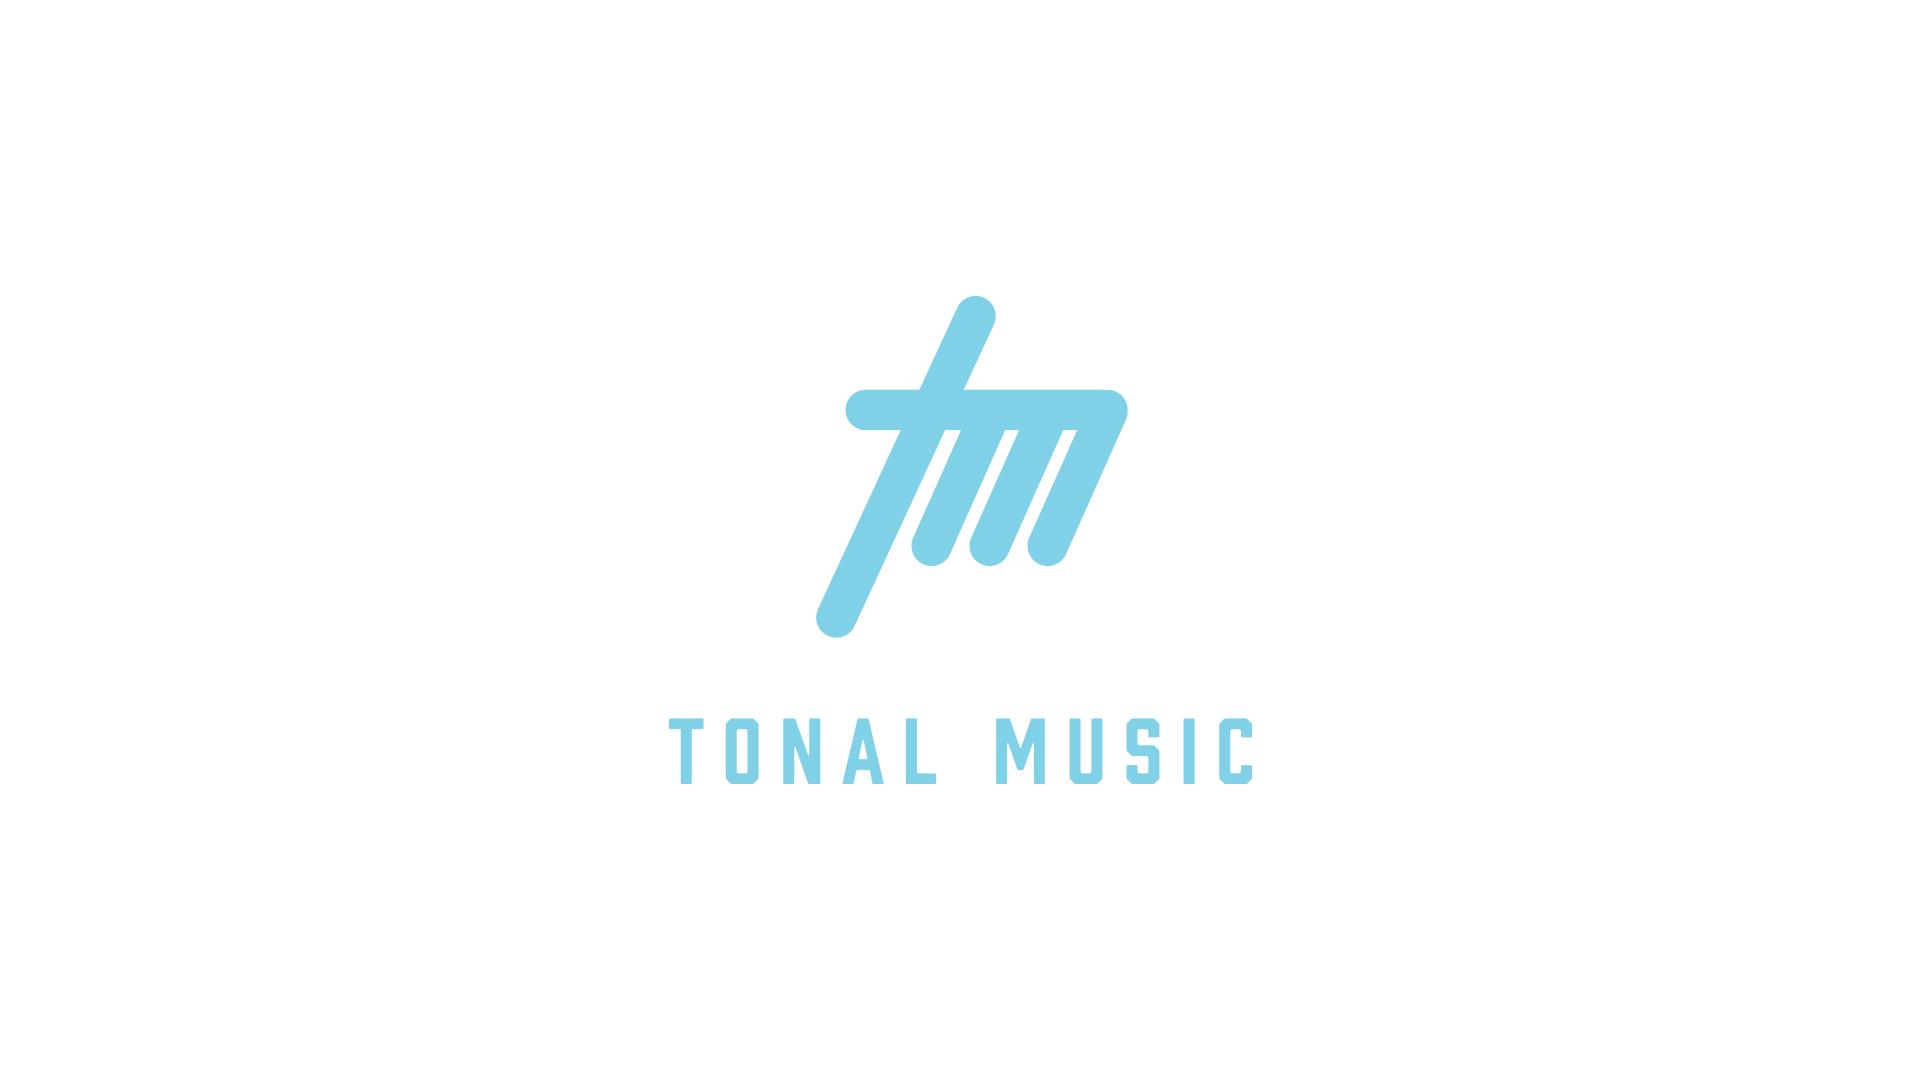 tonal music logo 8.jpg